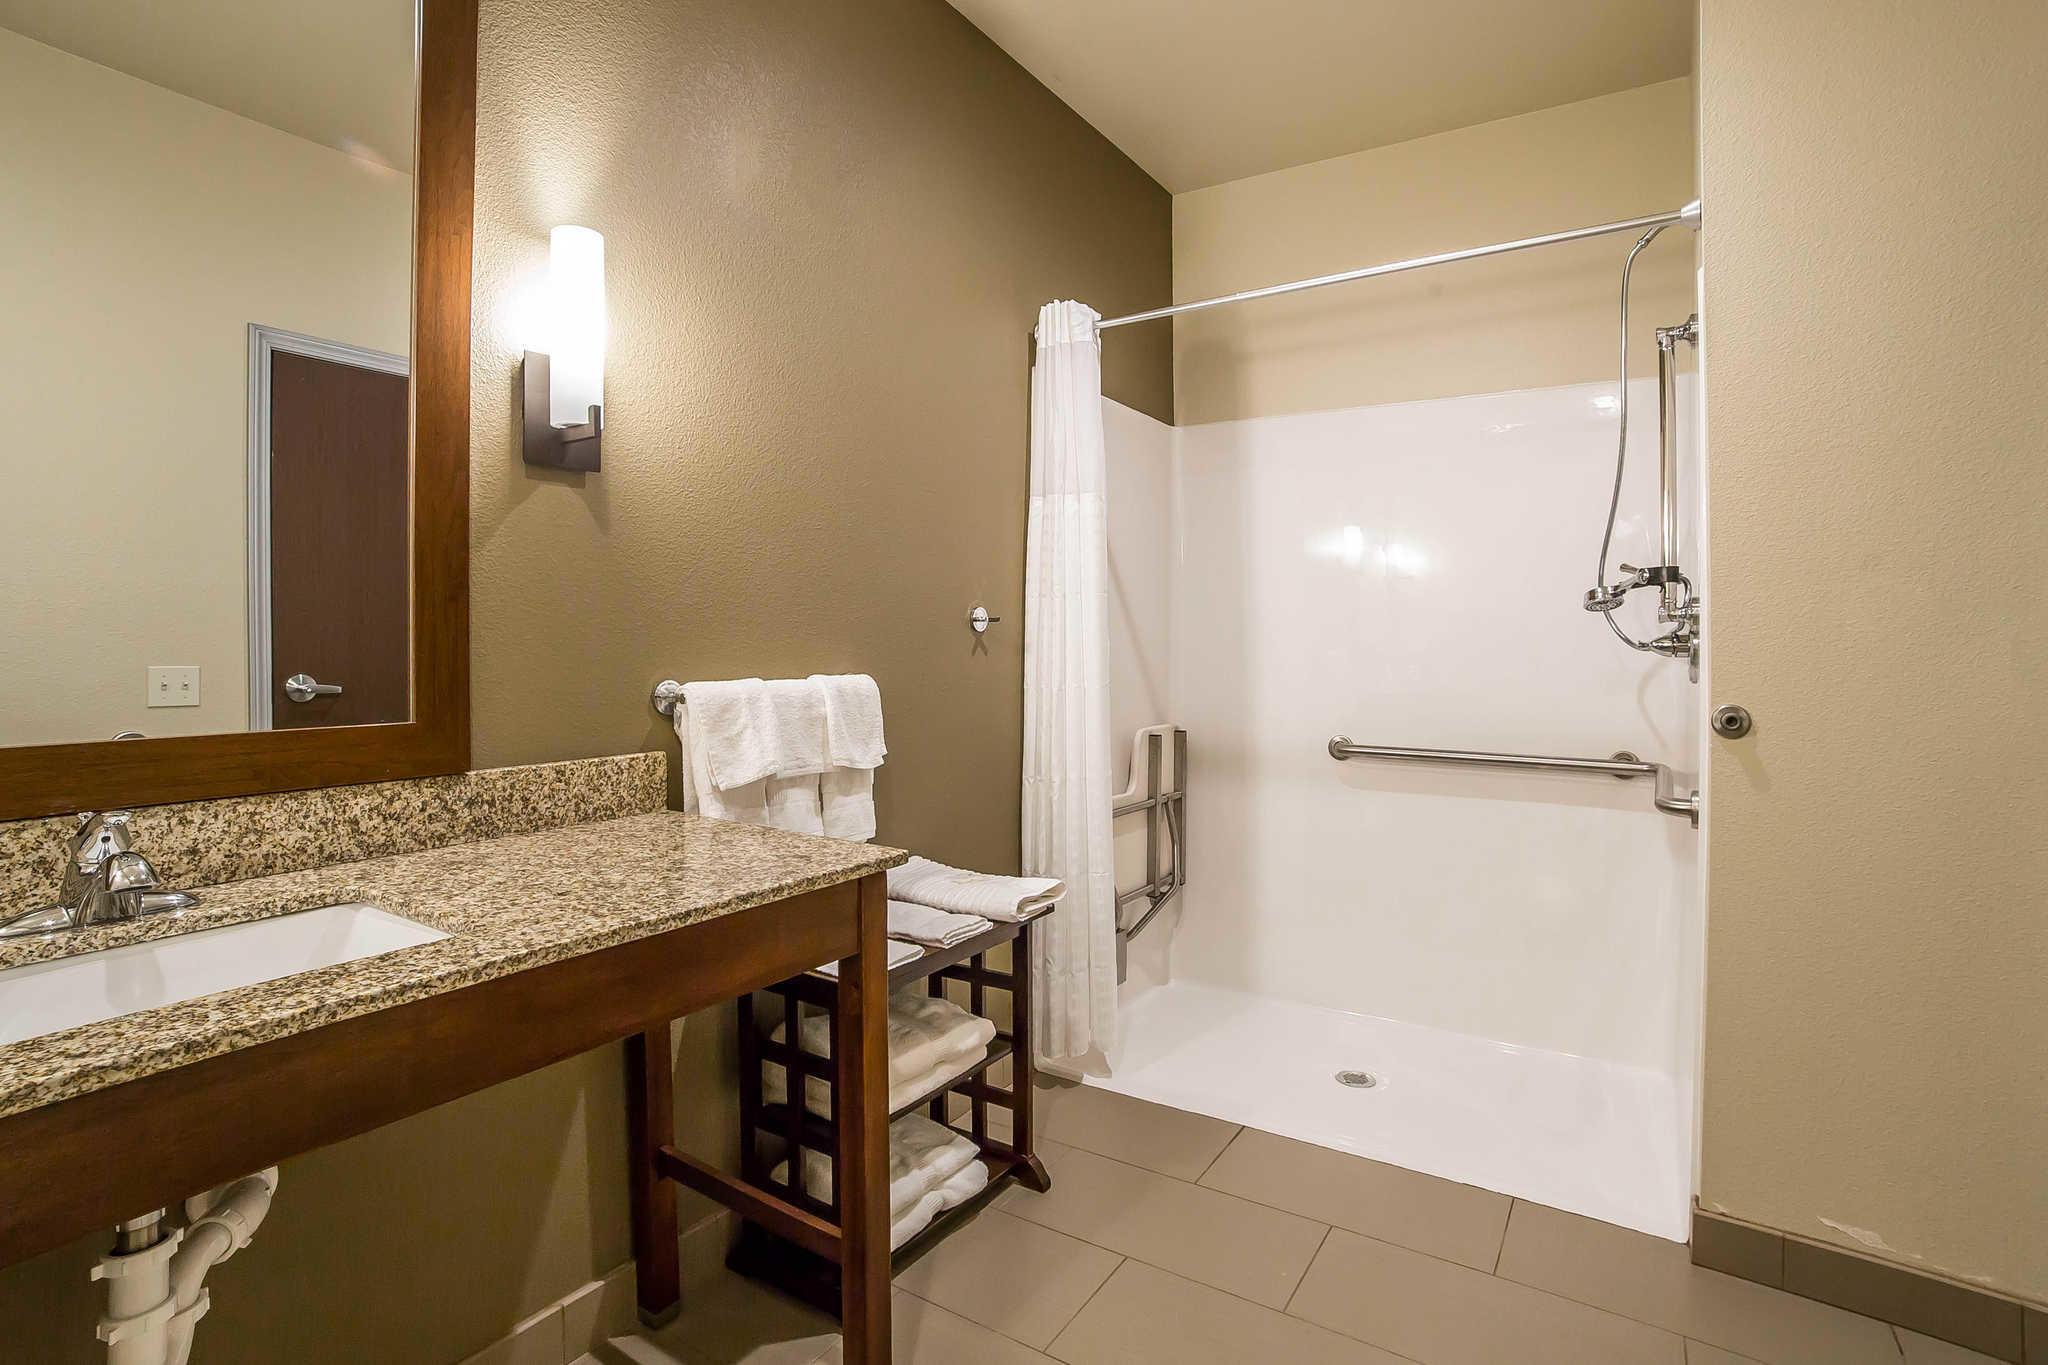 Comfort Inn & Suites Near Mt. Rushmore image 14